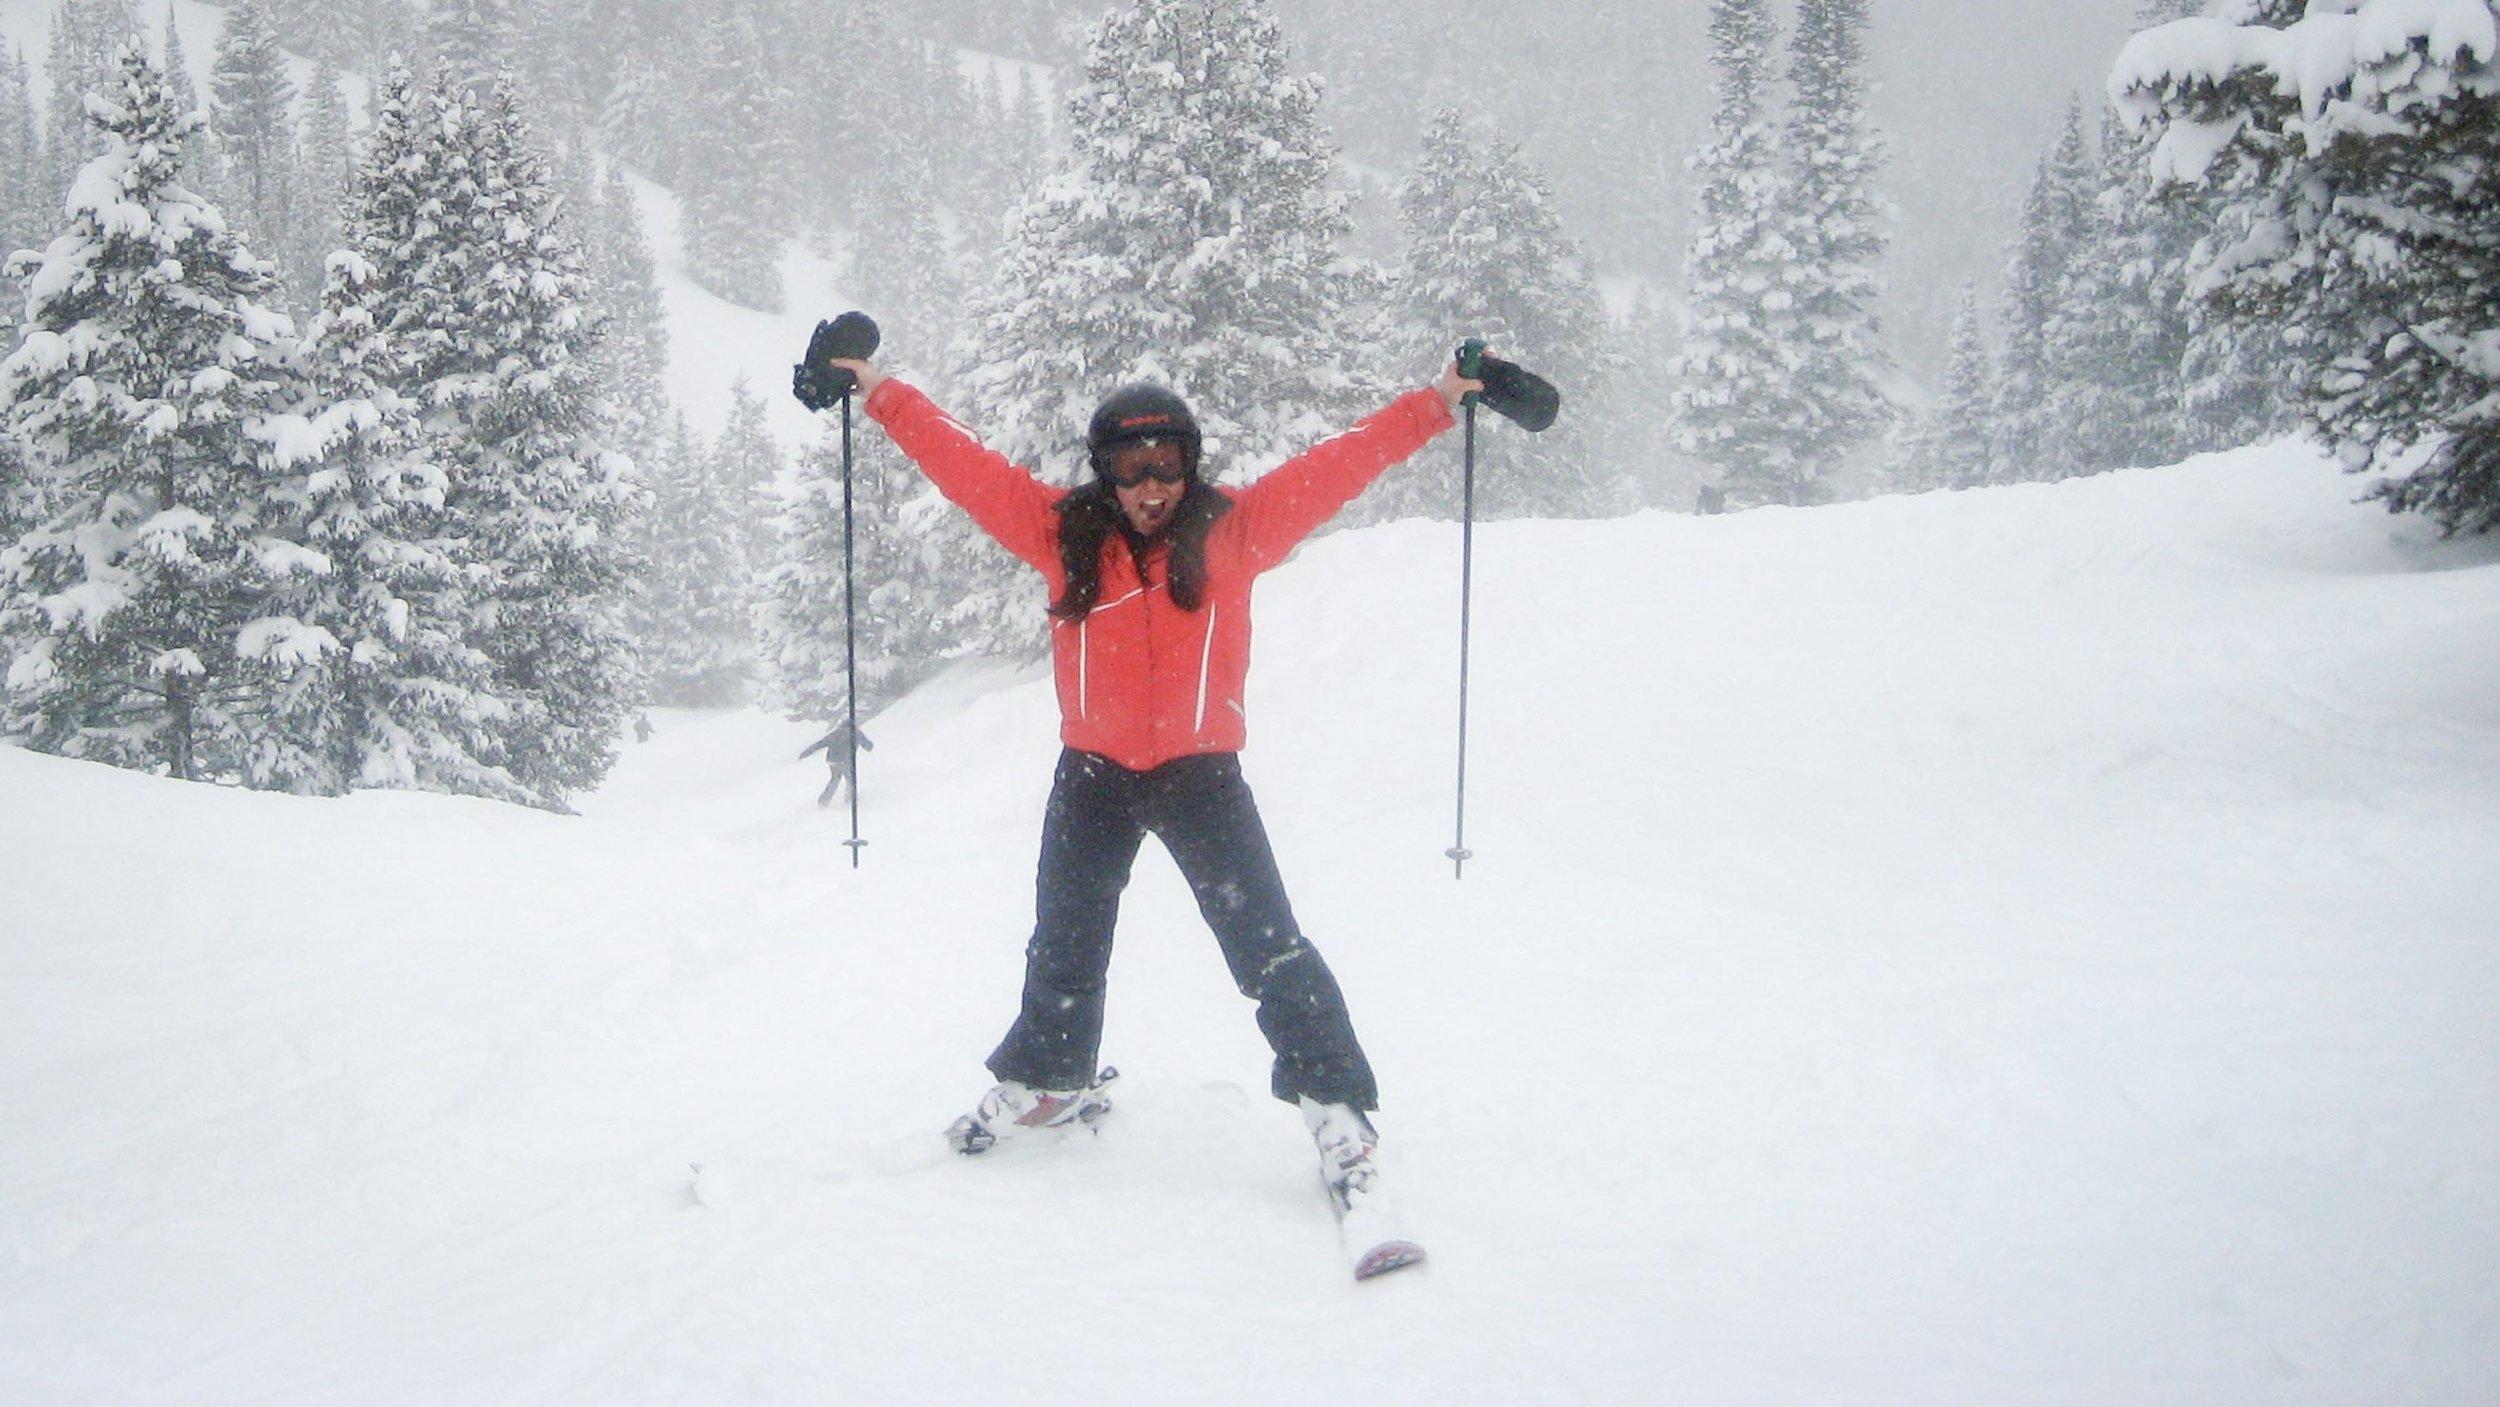 Susan Shain enjoys a powder day in Colorado. (Photo courtesy Susan Shain)